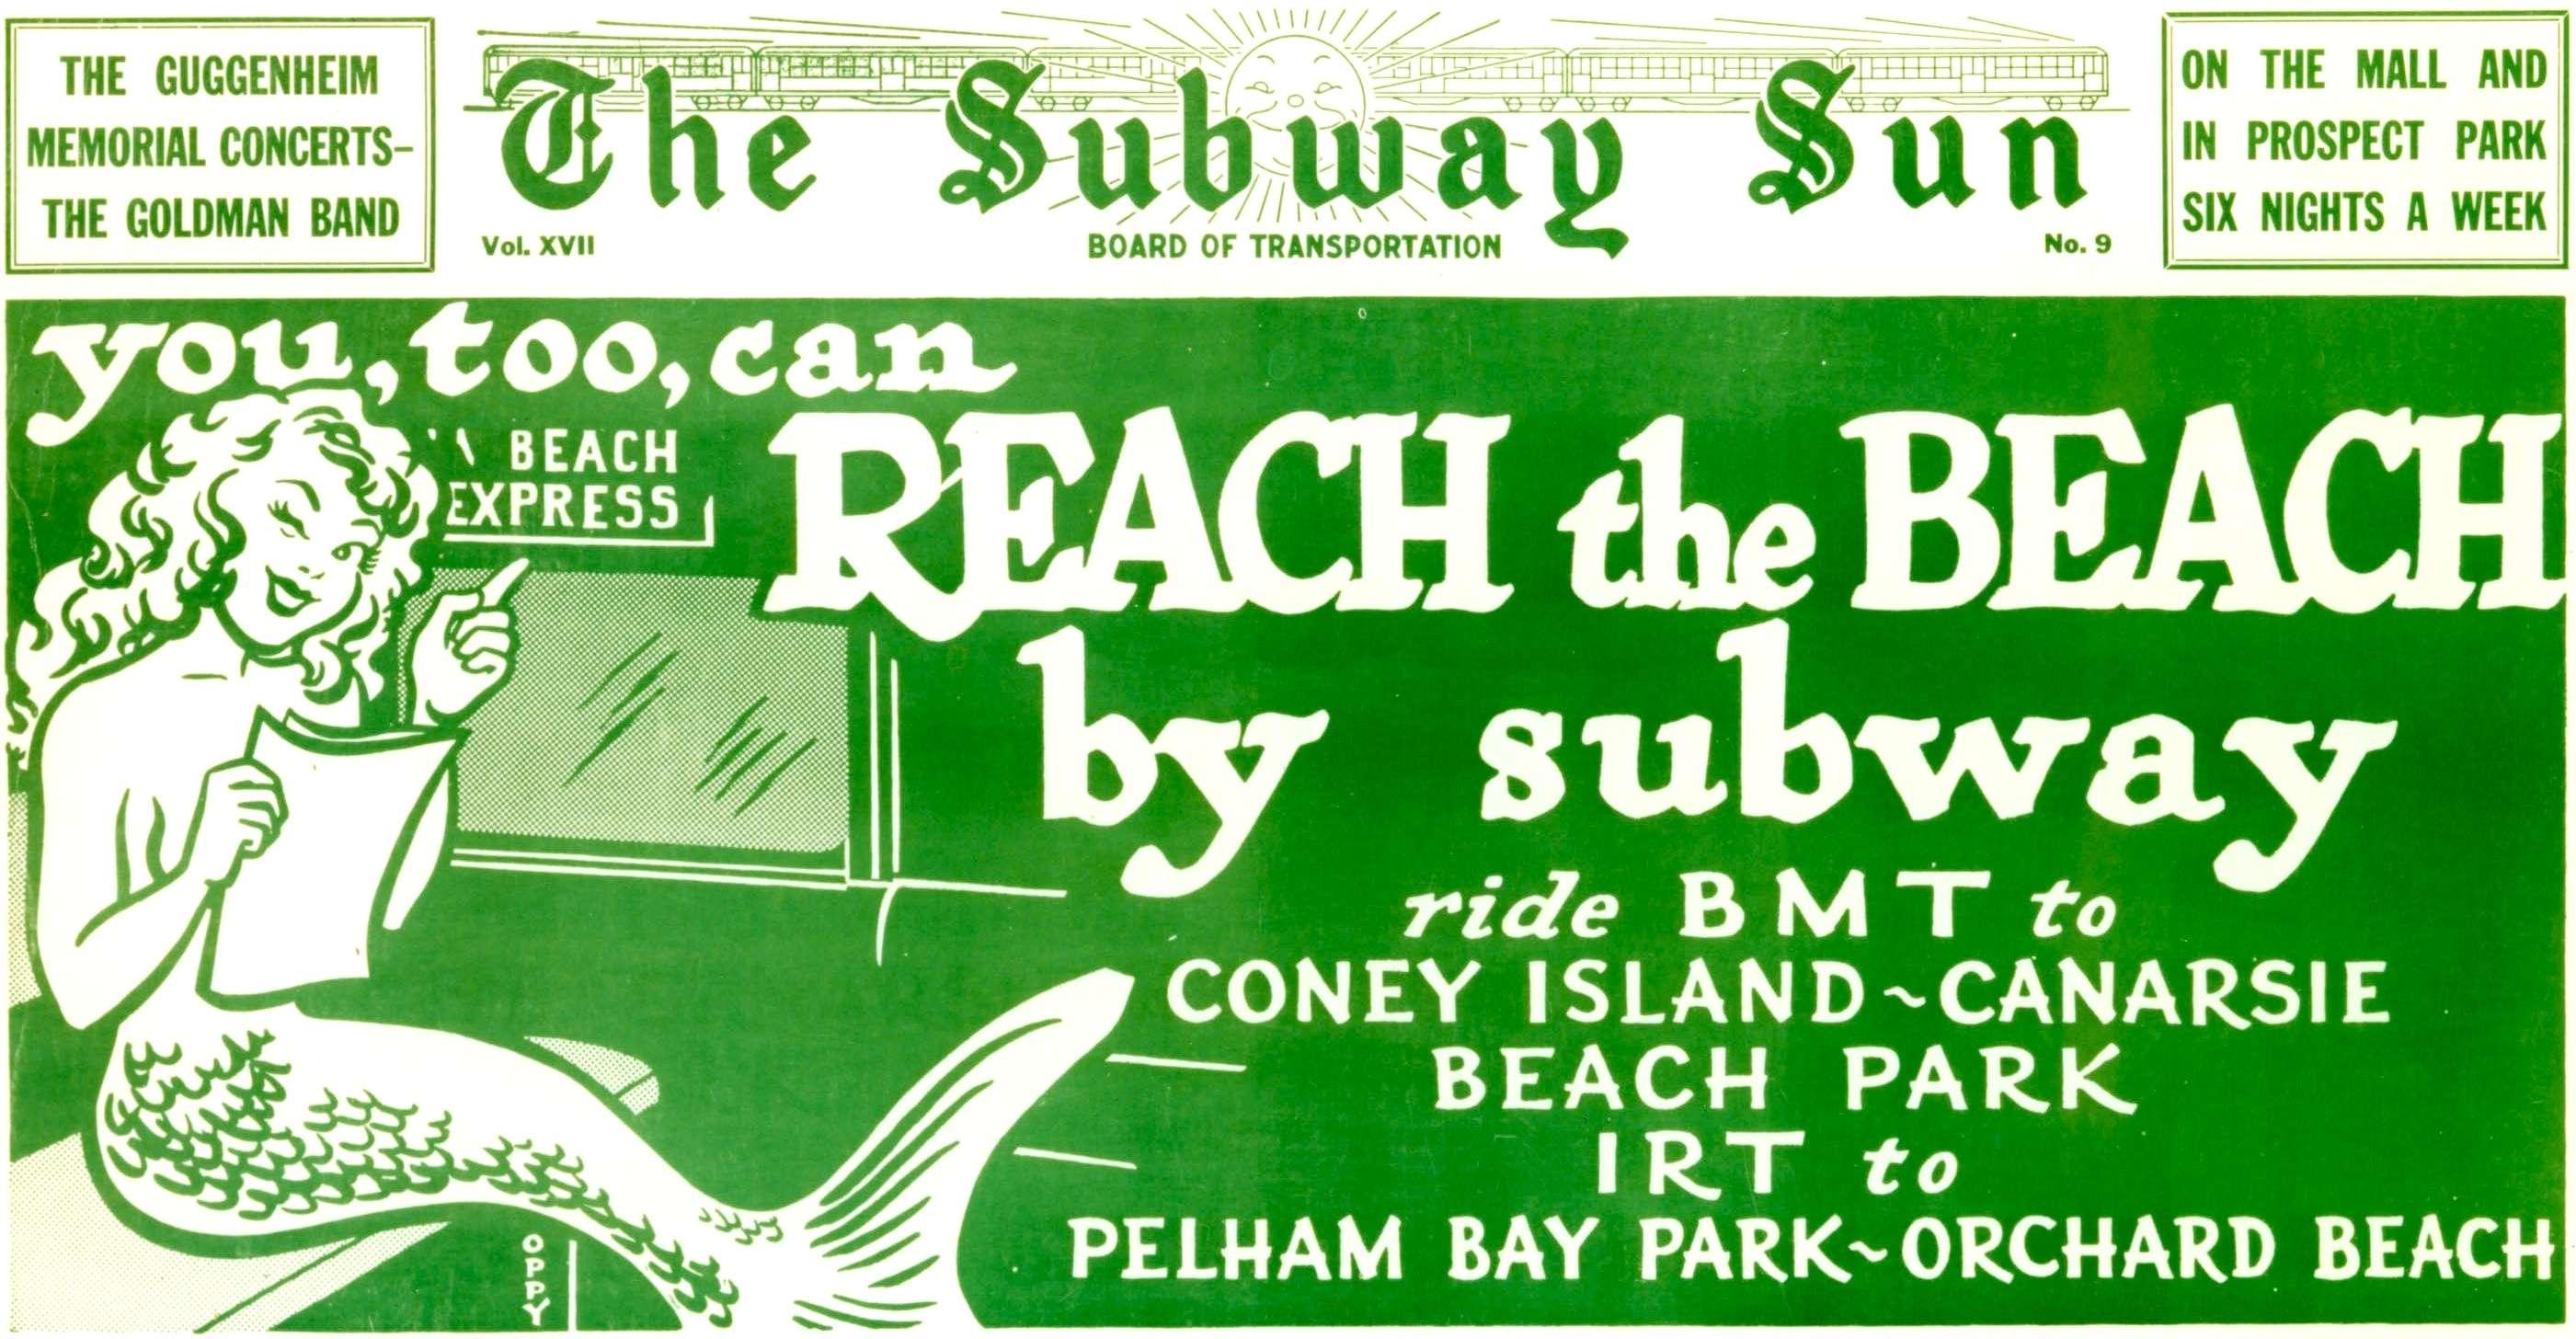 Beach-Bound-Coney-Island-Nostalgia-Ride